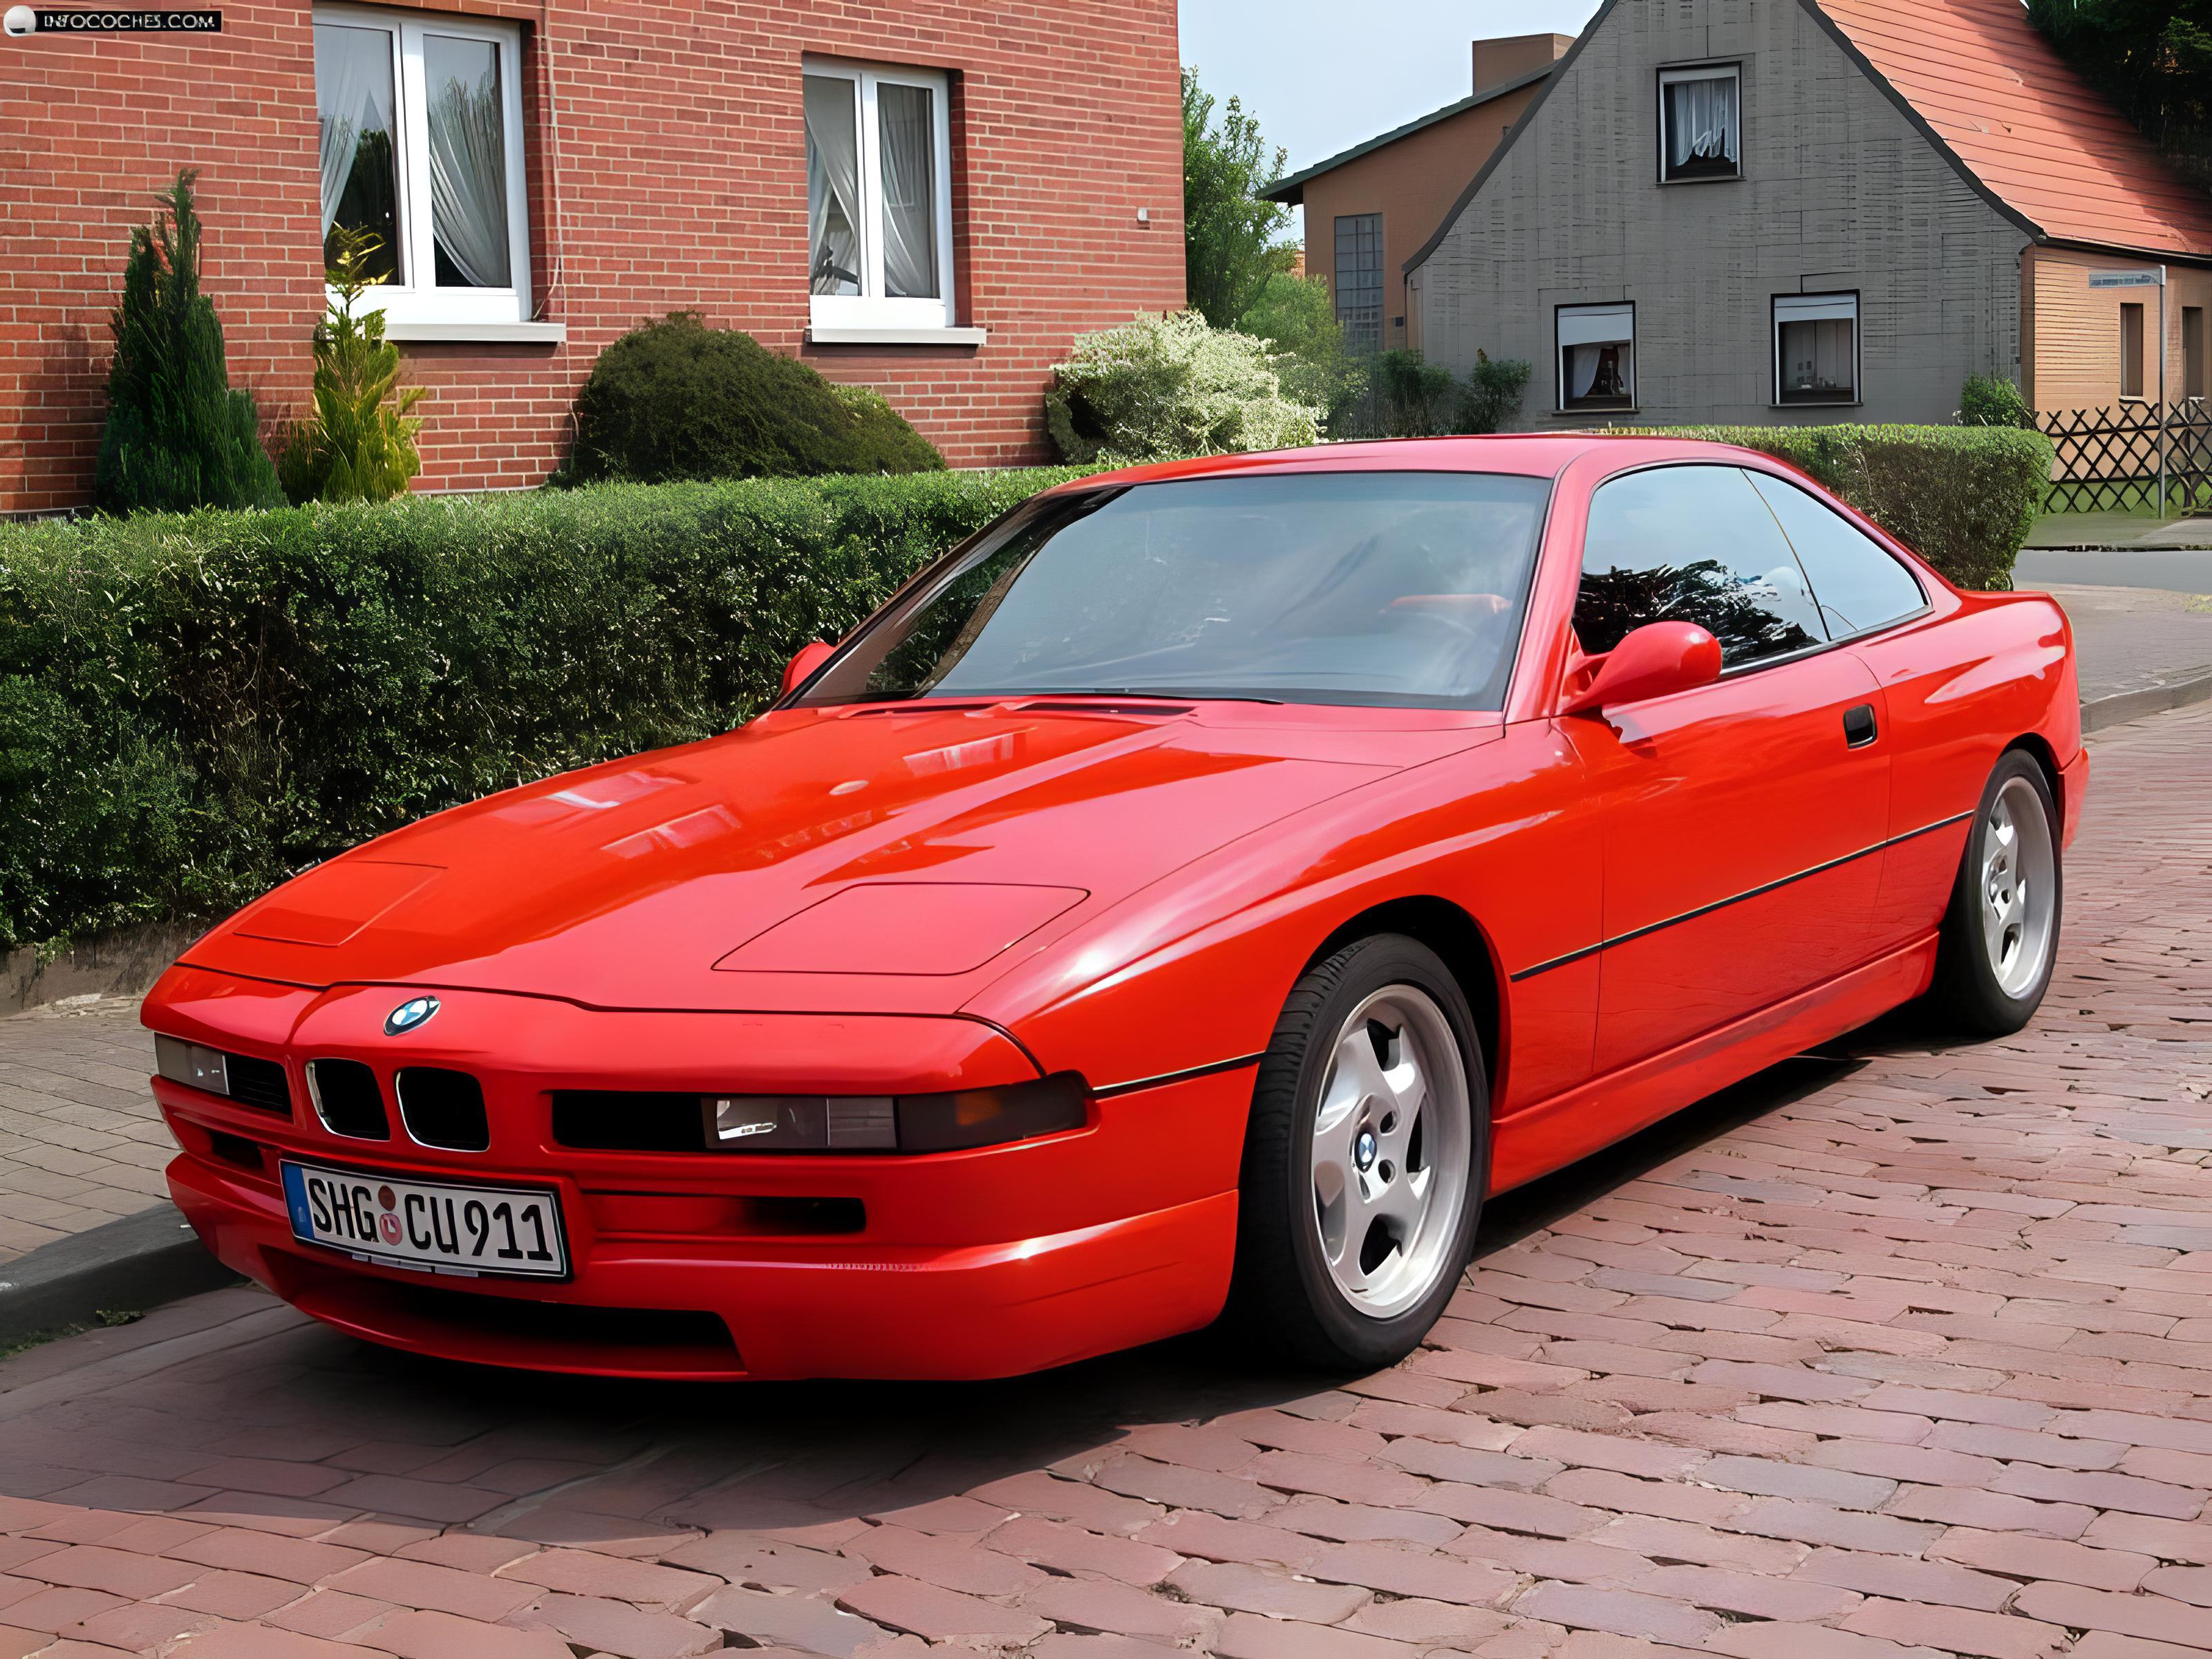 BMW CSI Photos On Better Parts LTD - 850csi bmw for sale